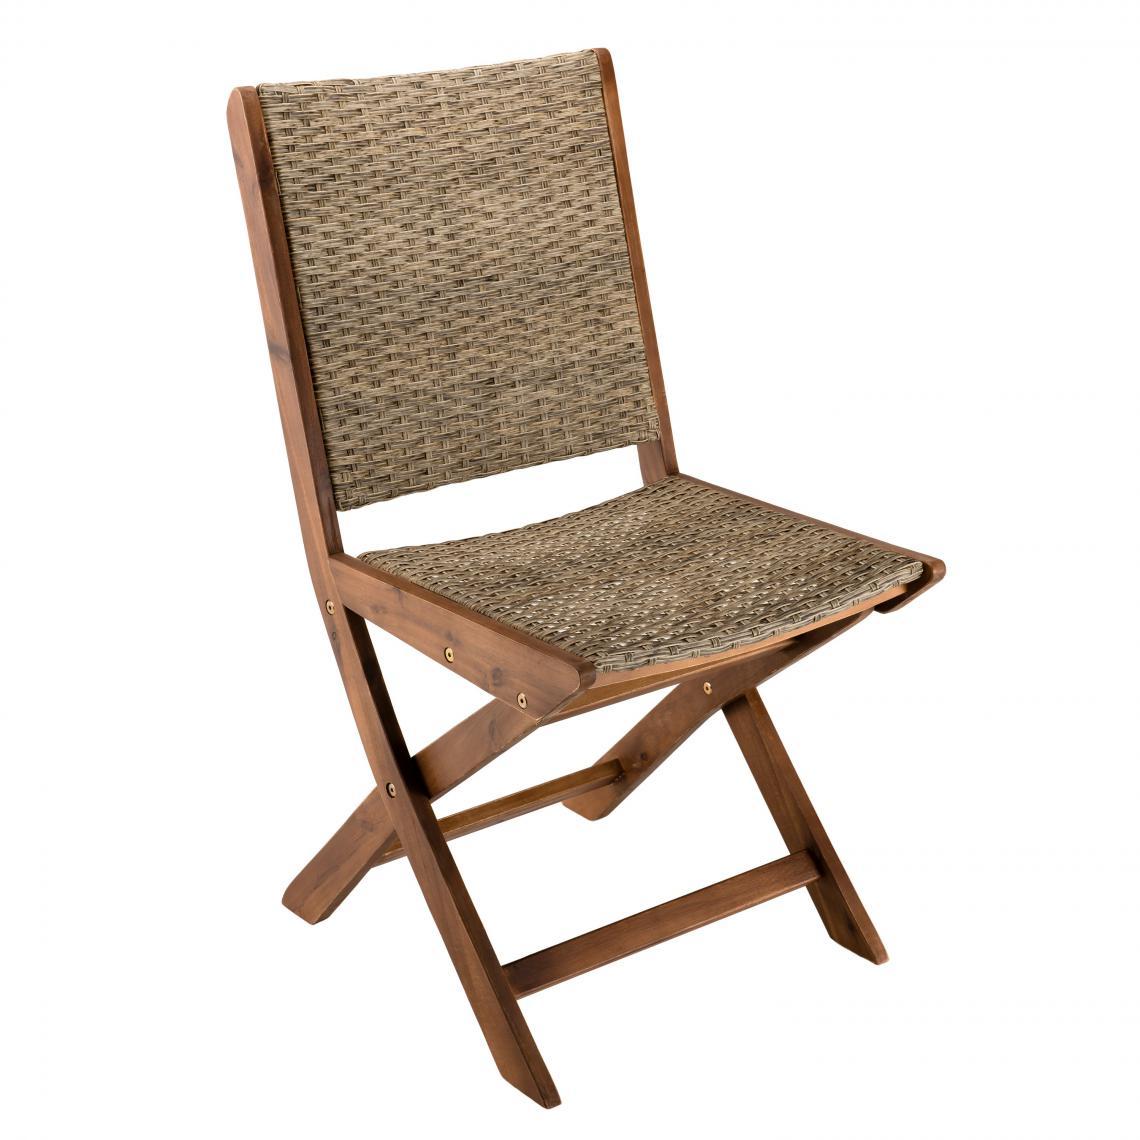 ensemble de 2 chaises de jardin pliantes en bois acacia et rotin synthetique